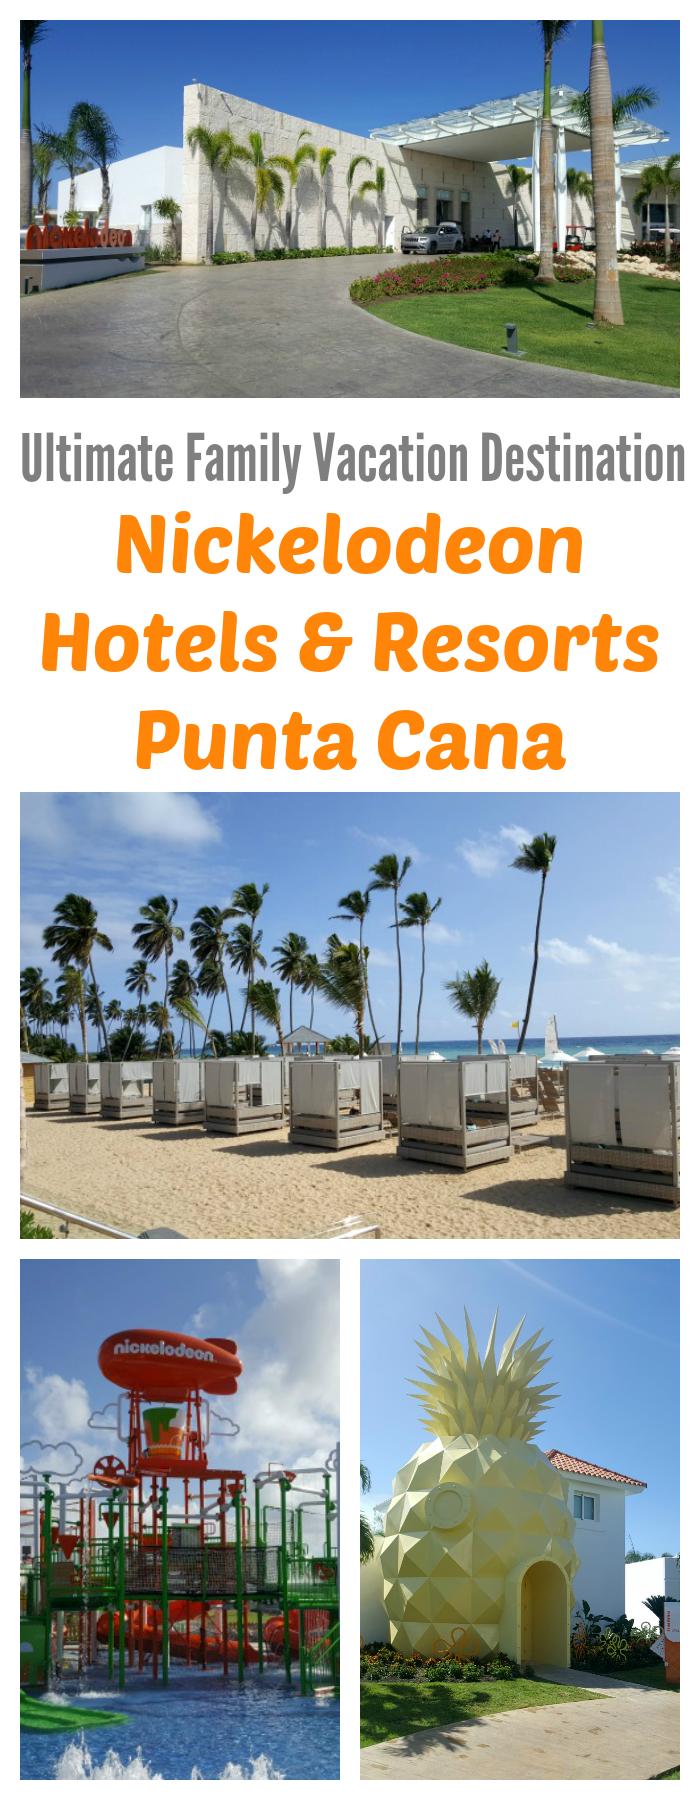 nickelodeon-hotels-resorts-punta-cana-ultimate-family-vacation-destination